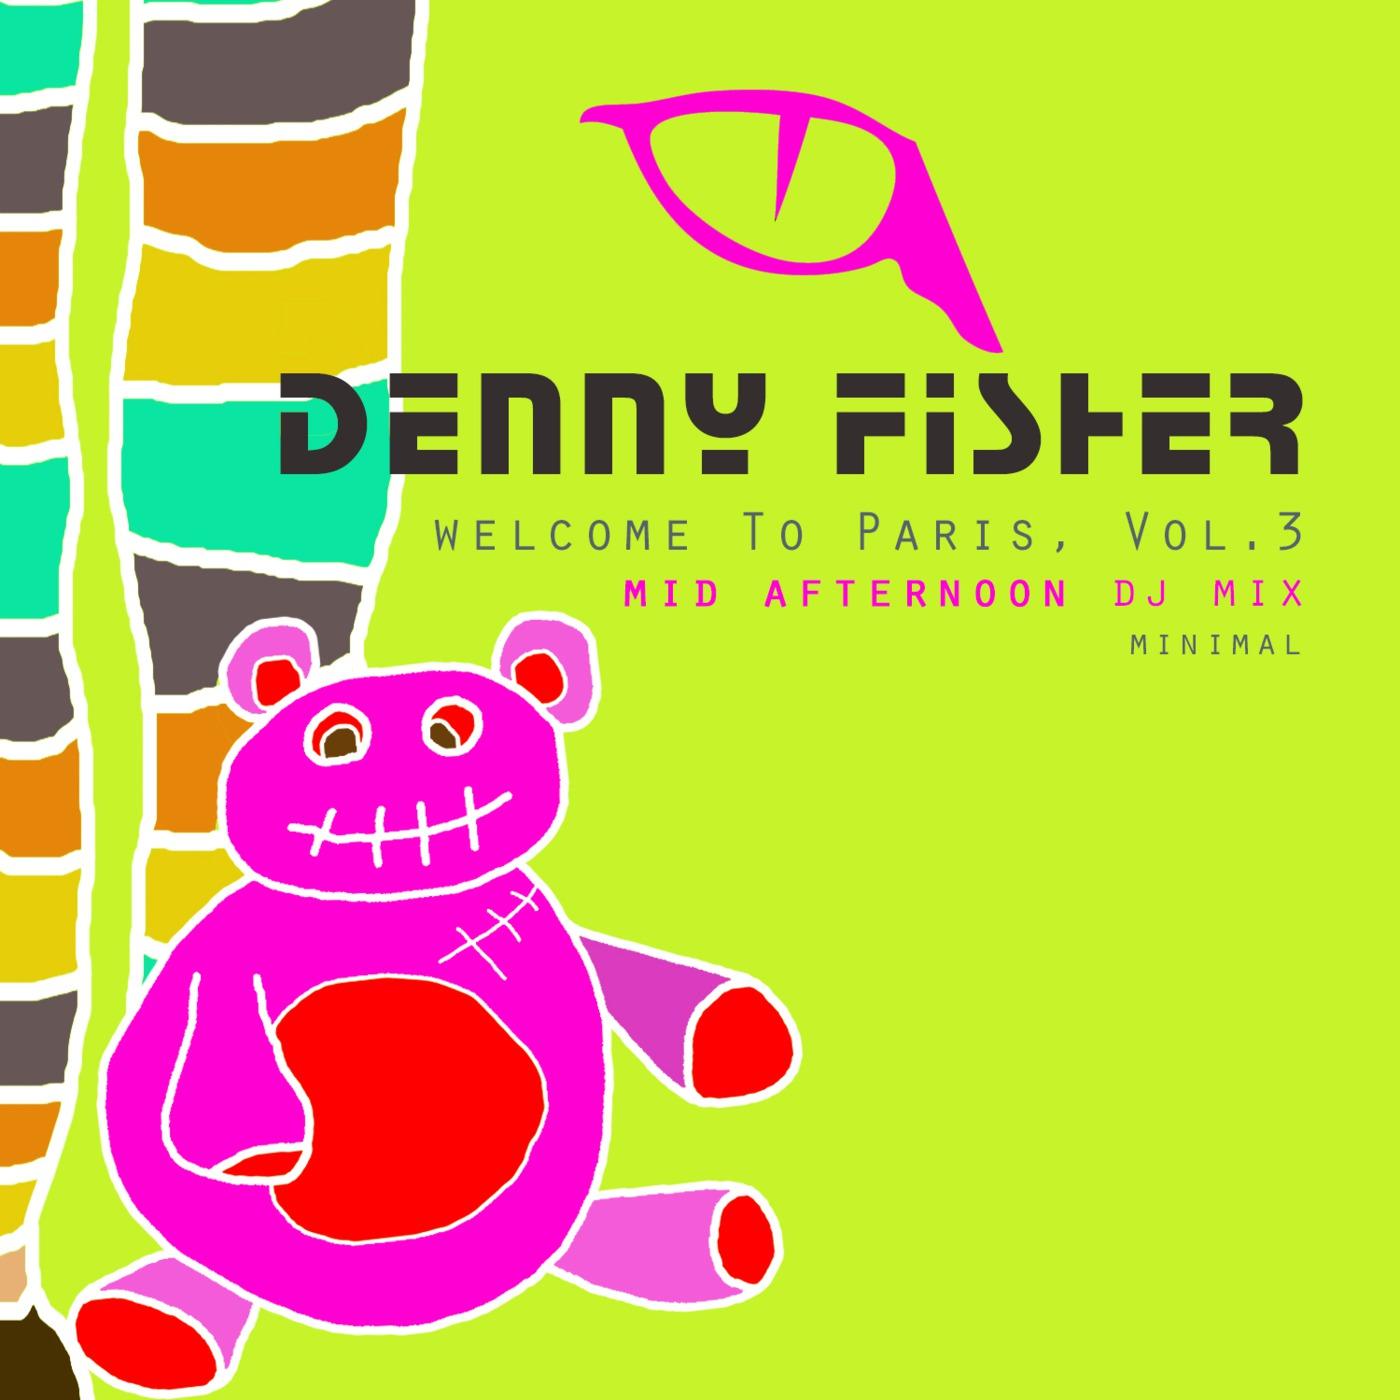 Denny Fisher Welcome To Paris Vol3 Mi Afternoon Dj Mix